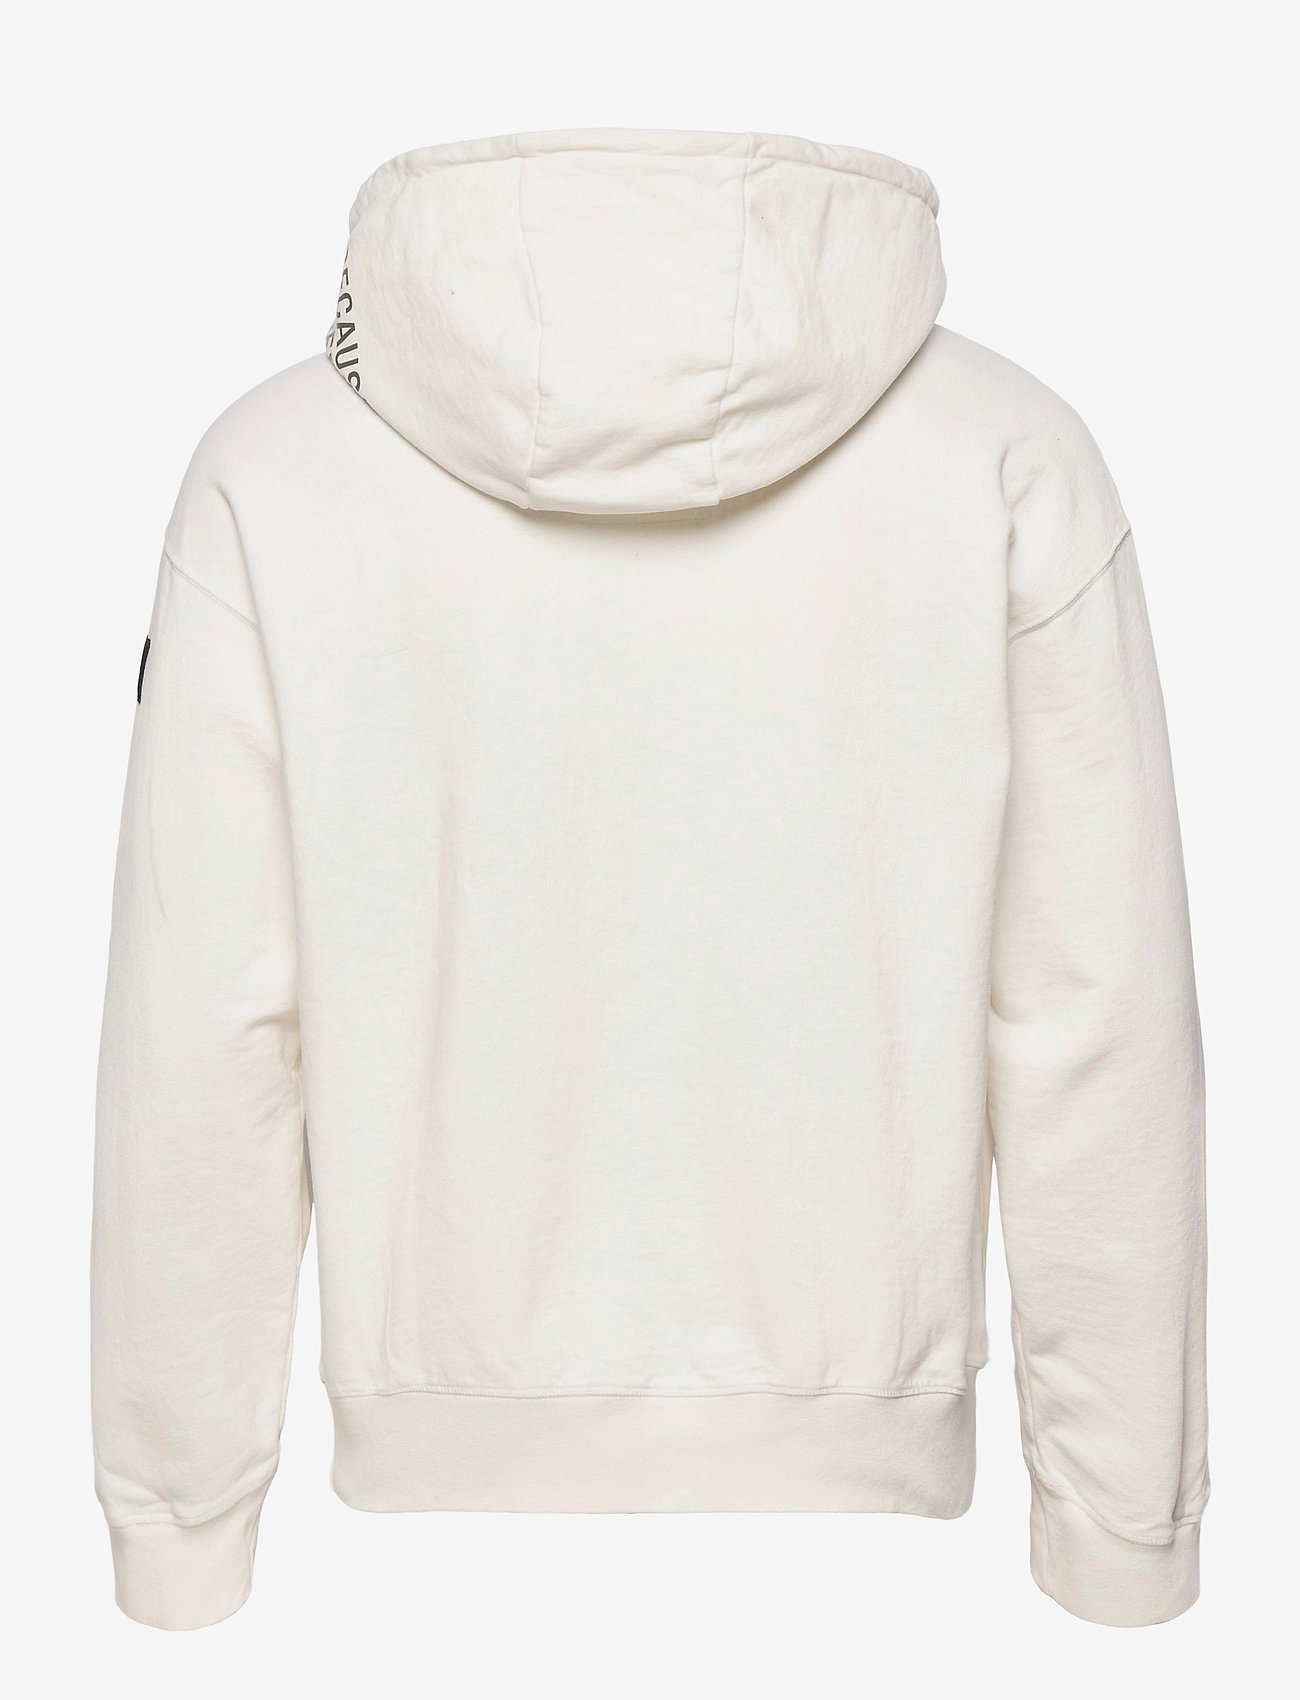 ECOALF - LUCCA SWEATSHIRT MAN - hoodies - off white - 1